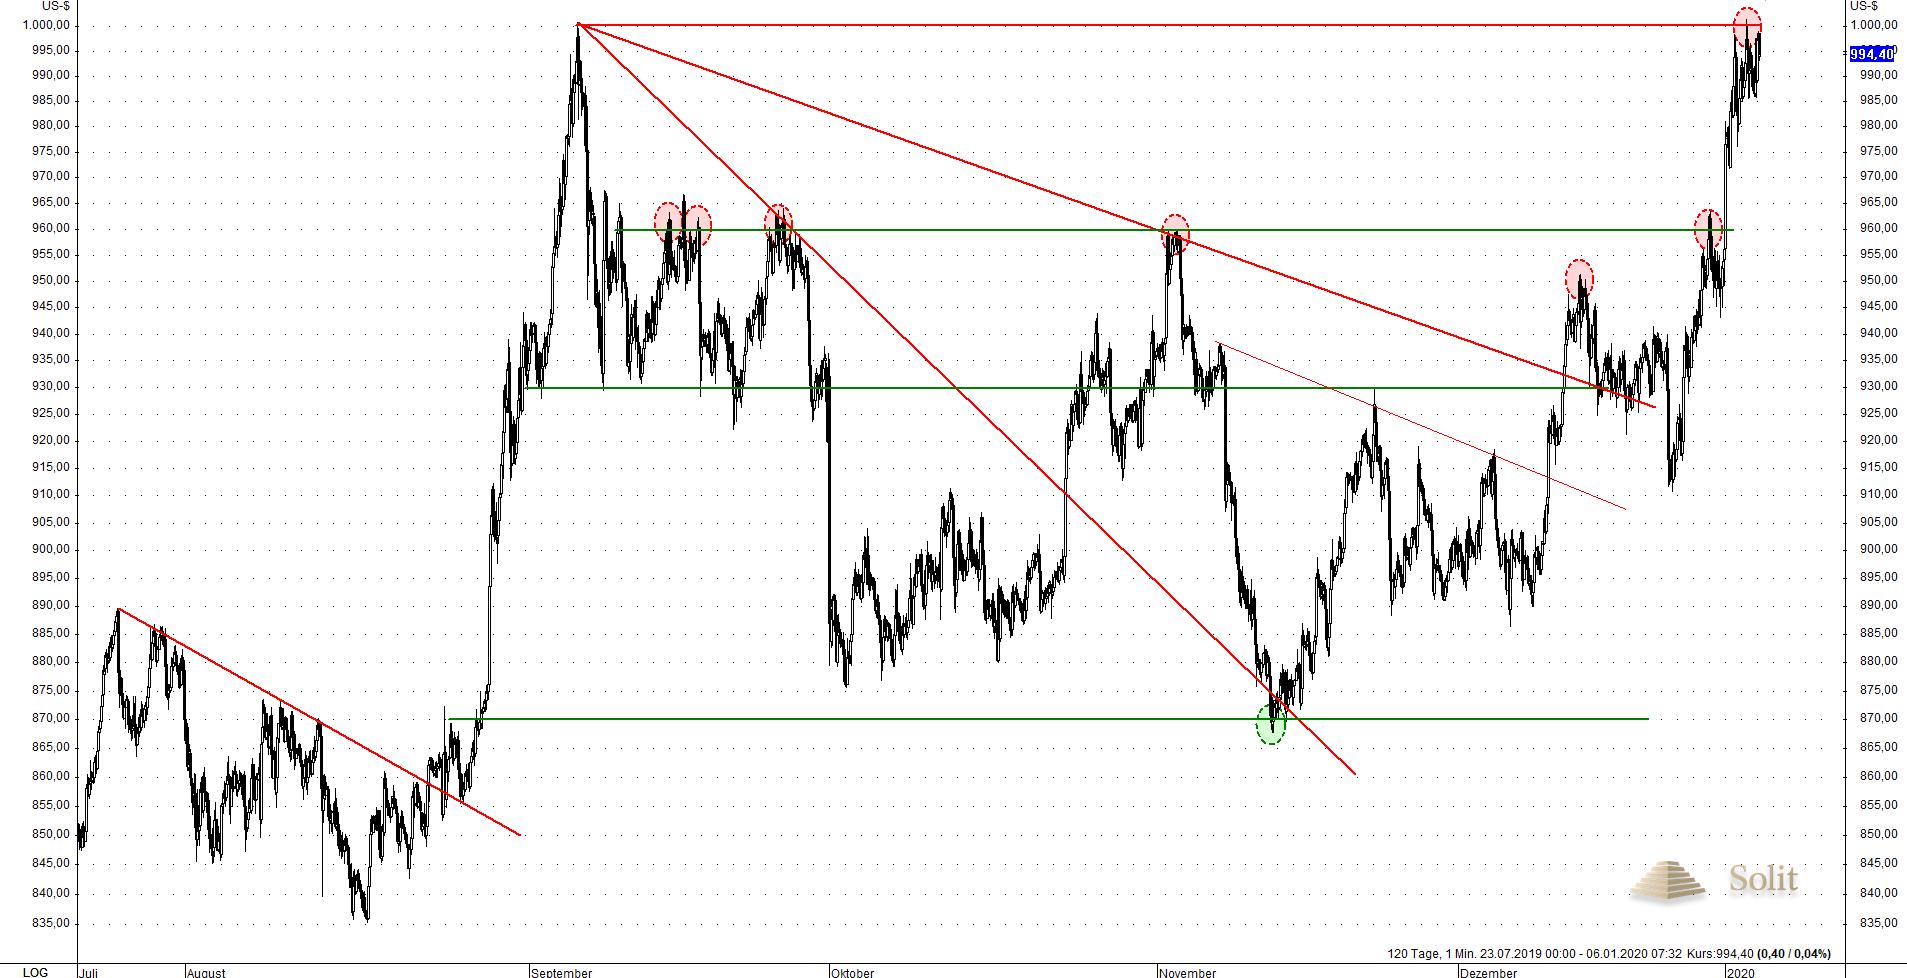 Platinum Commitment of Traders V 06.01.2020